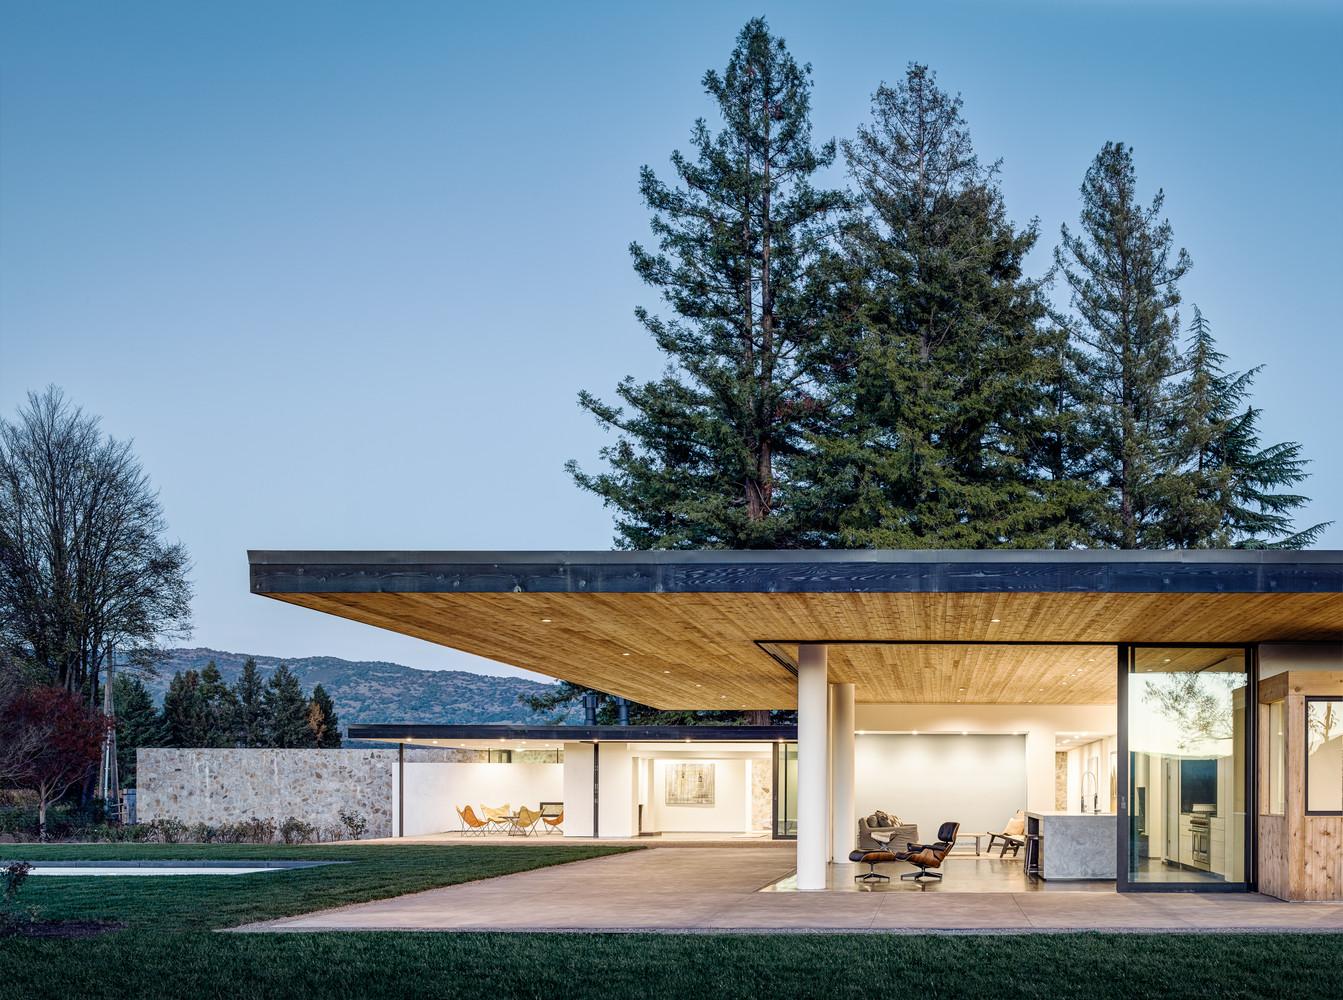 Gallery of House Set On The Valley Floor / Jørgensen Design - 1